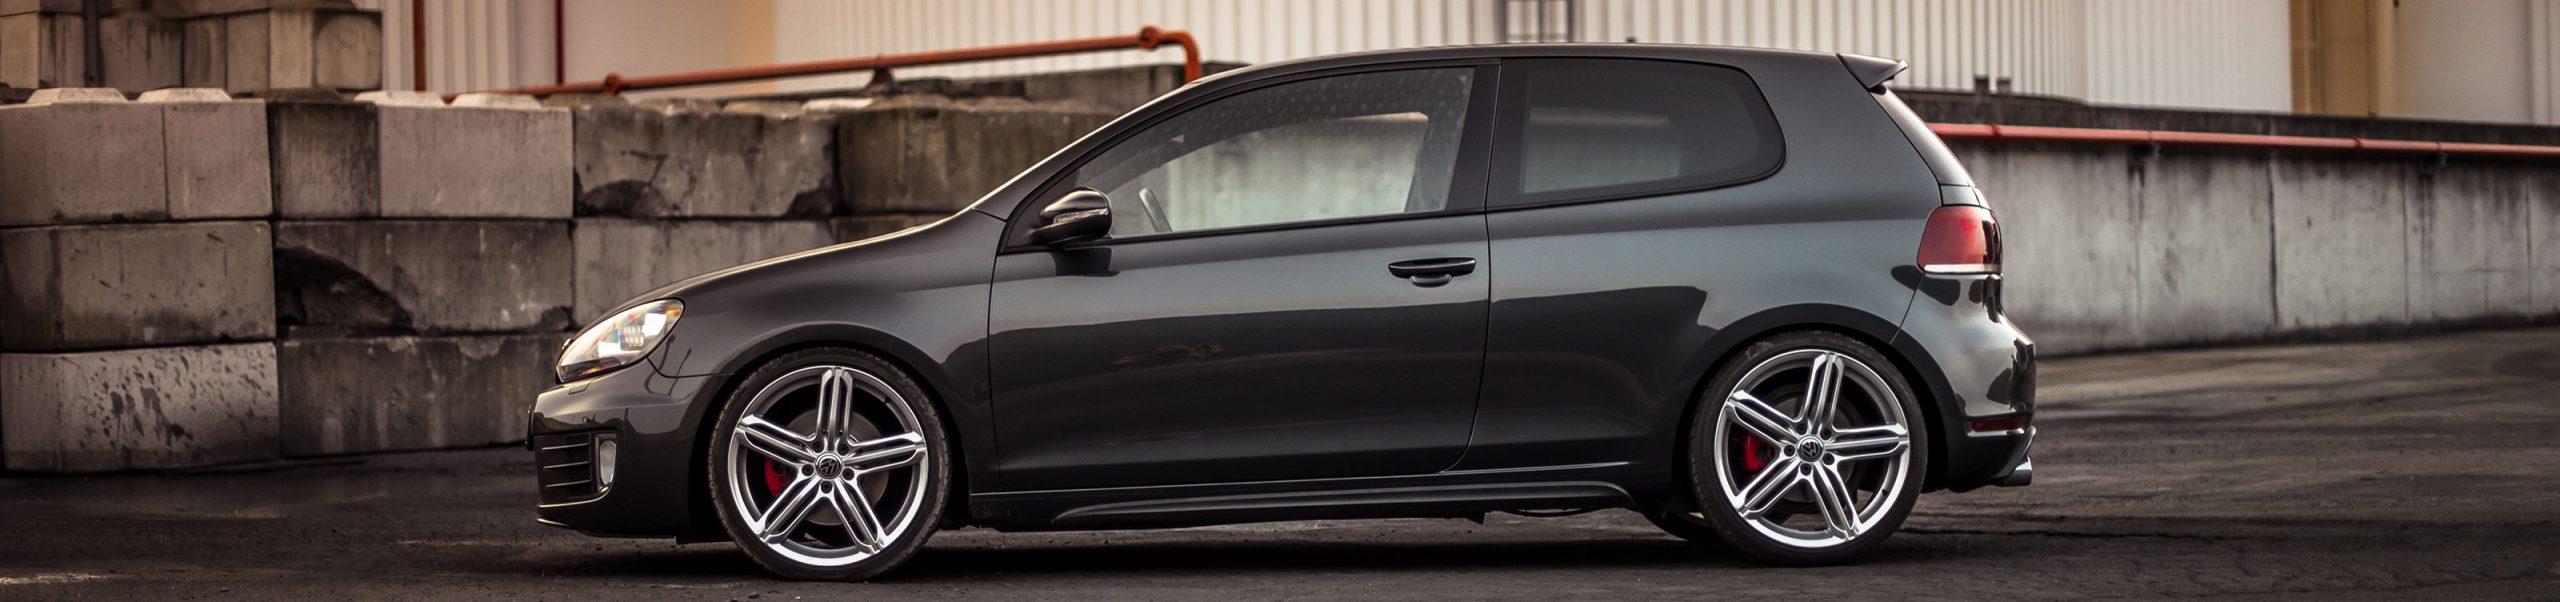 Volkswagen Tuning & Aftermarket Performance Parts